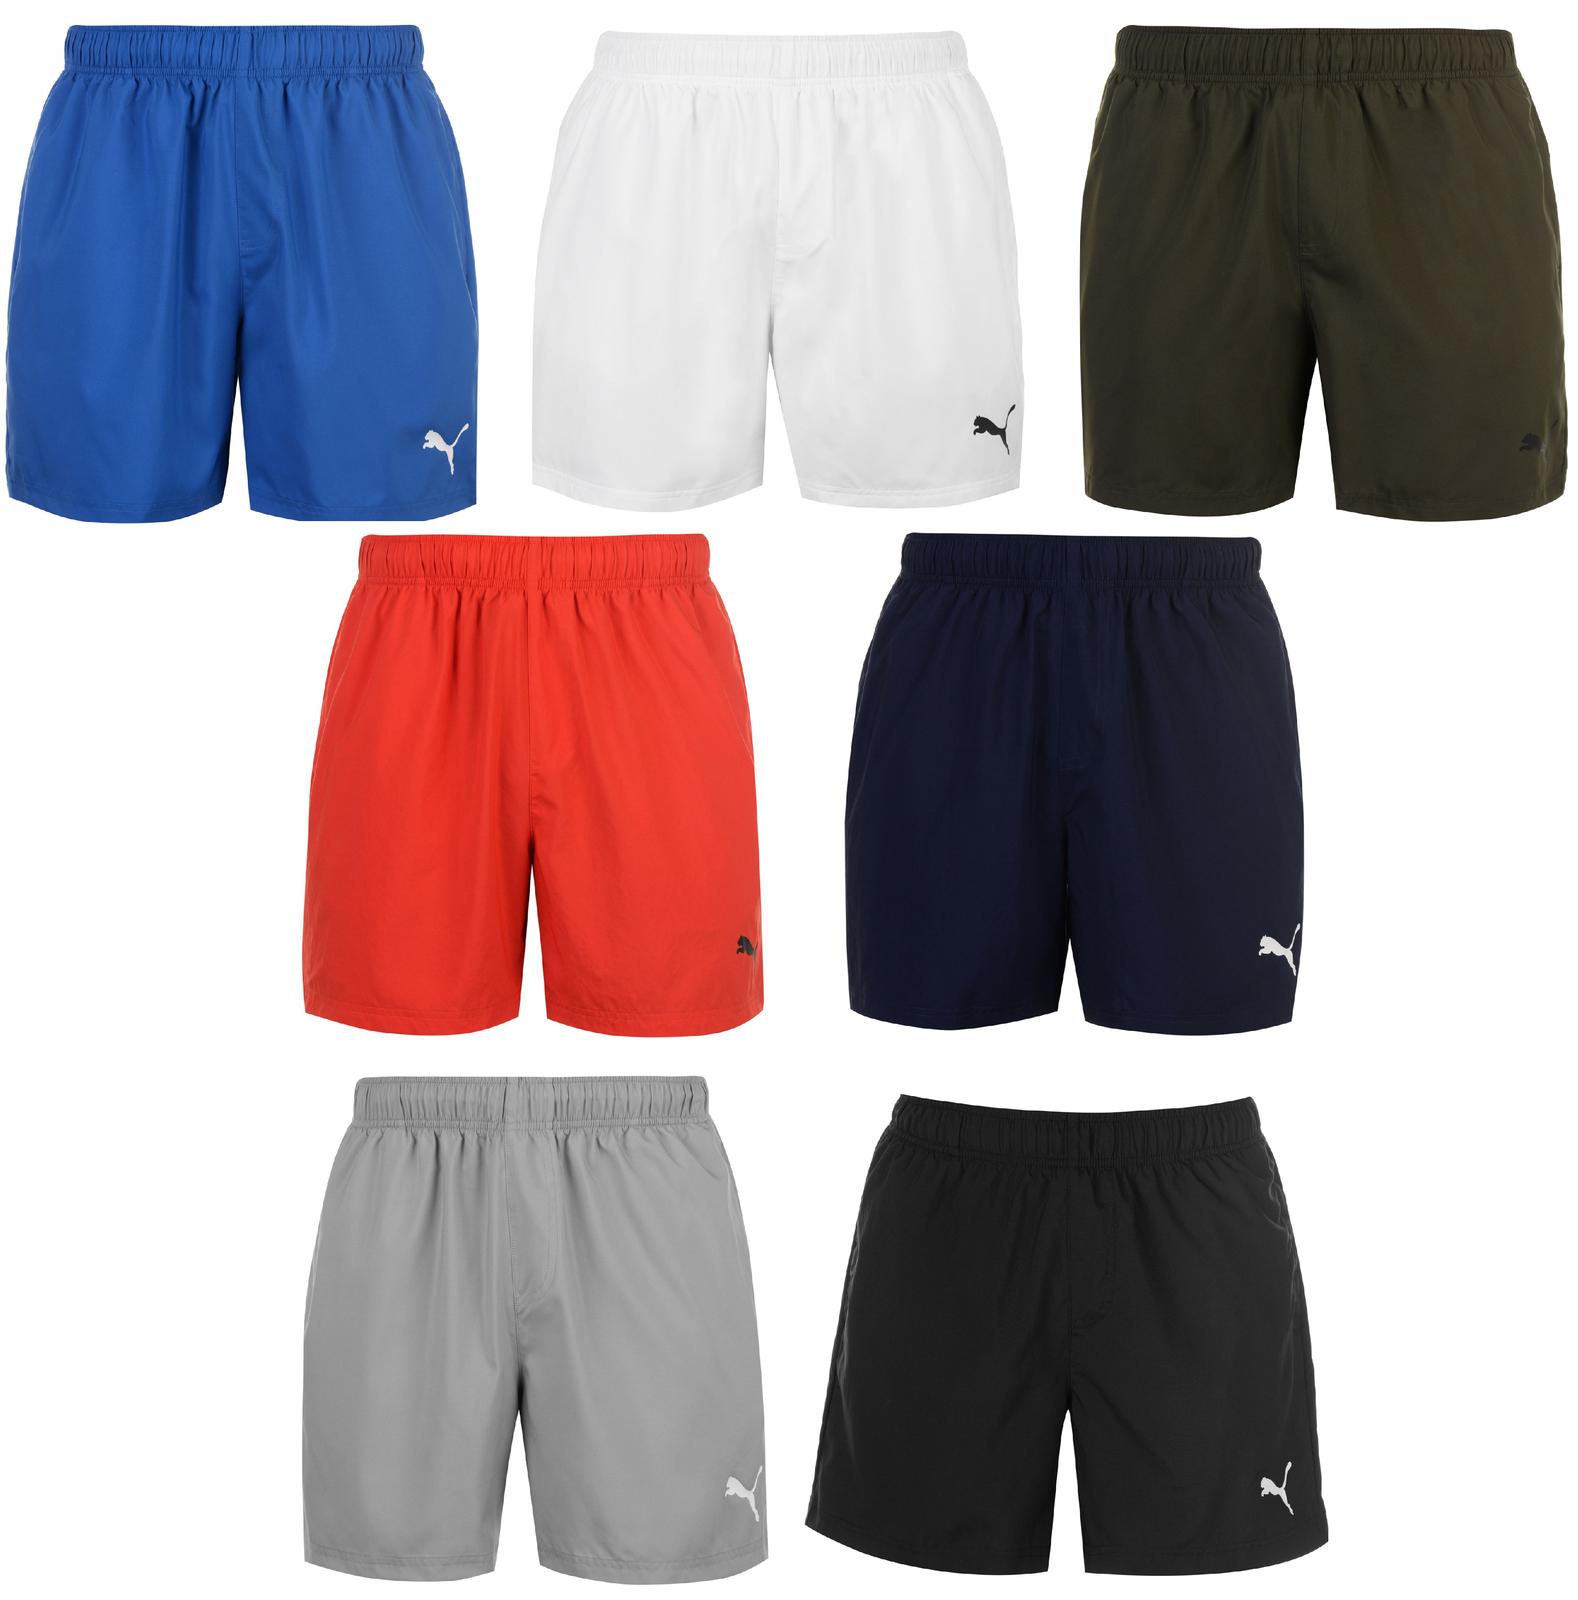 Puma Herren Shorts Sporthose Kurzhose Bermuda Sport Hose Fußball 7008    Bunt,